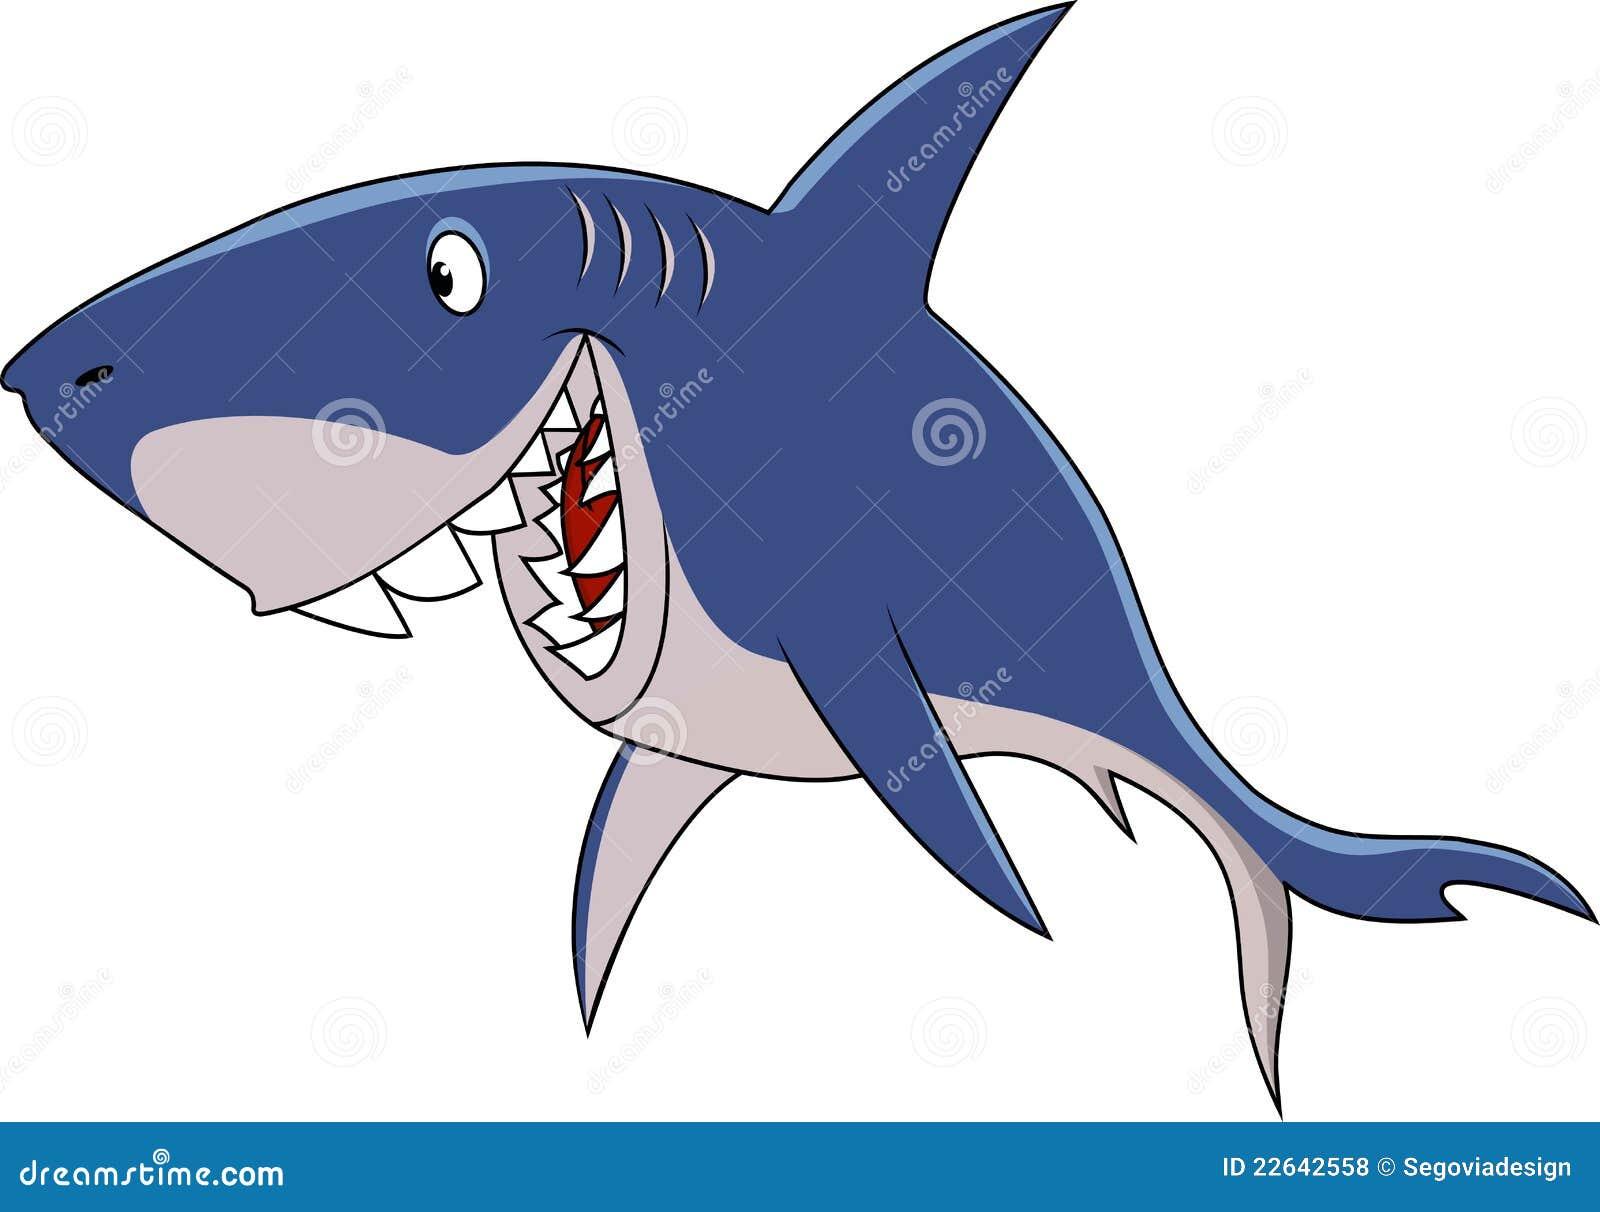 акулы смешные картинки